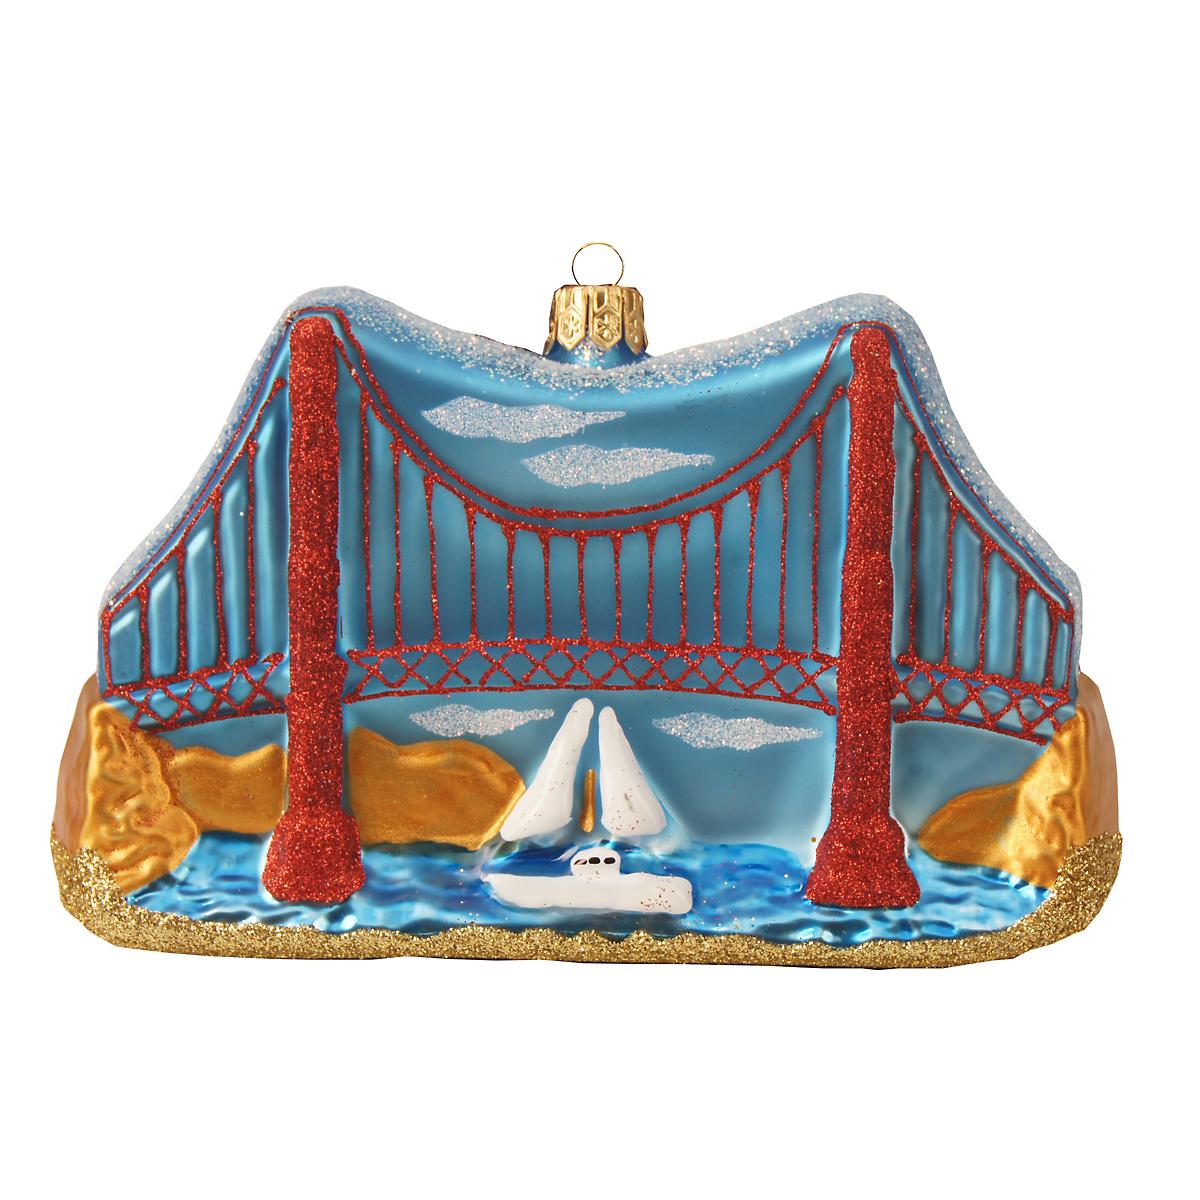 Golden gate bridge christmas ornament gump 39 s for Golden gate bridge jewelry